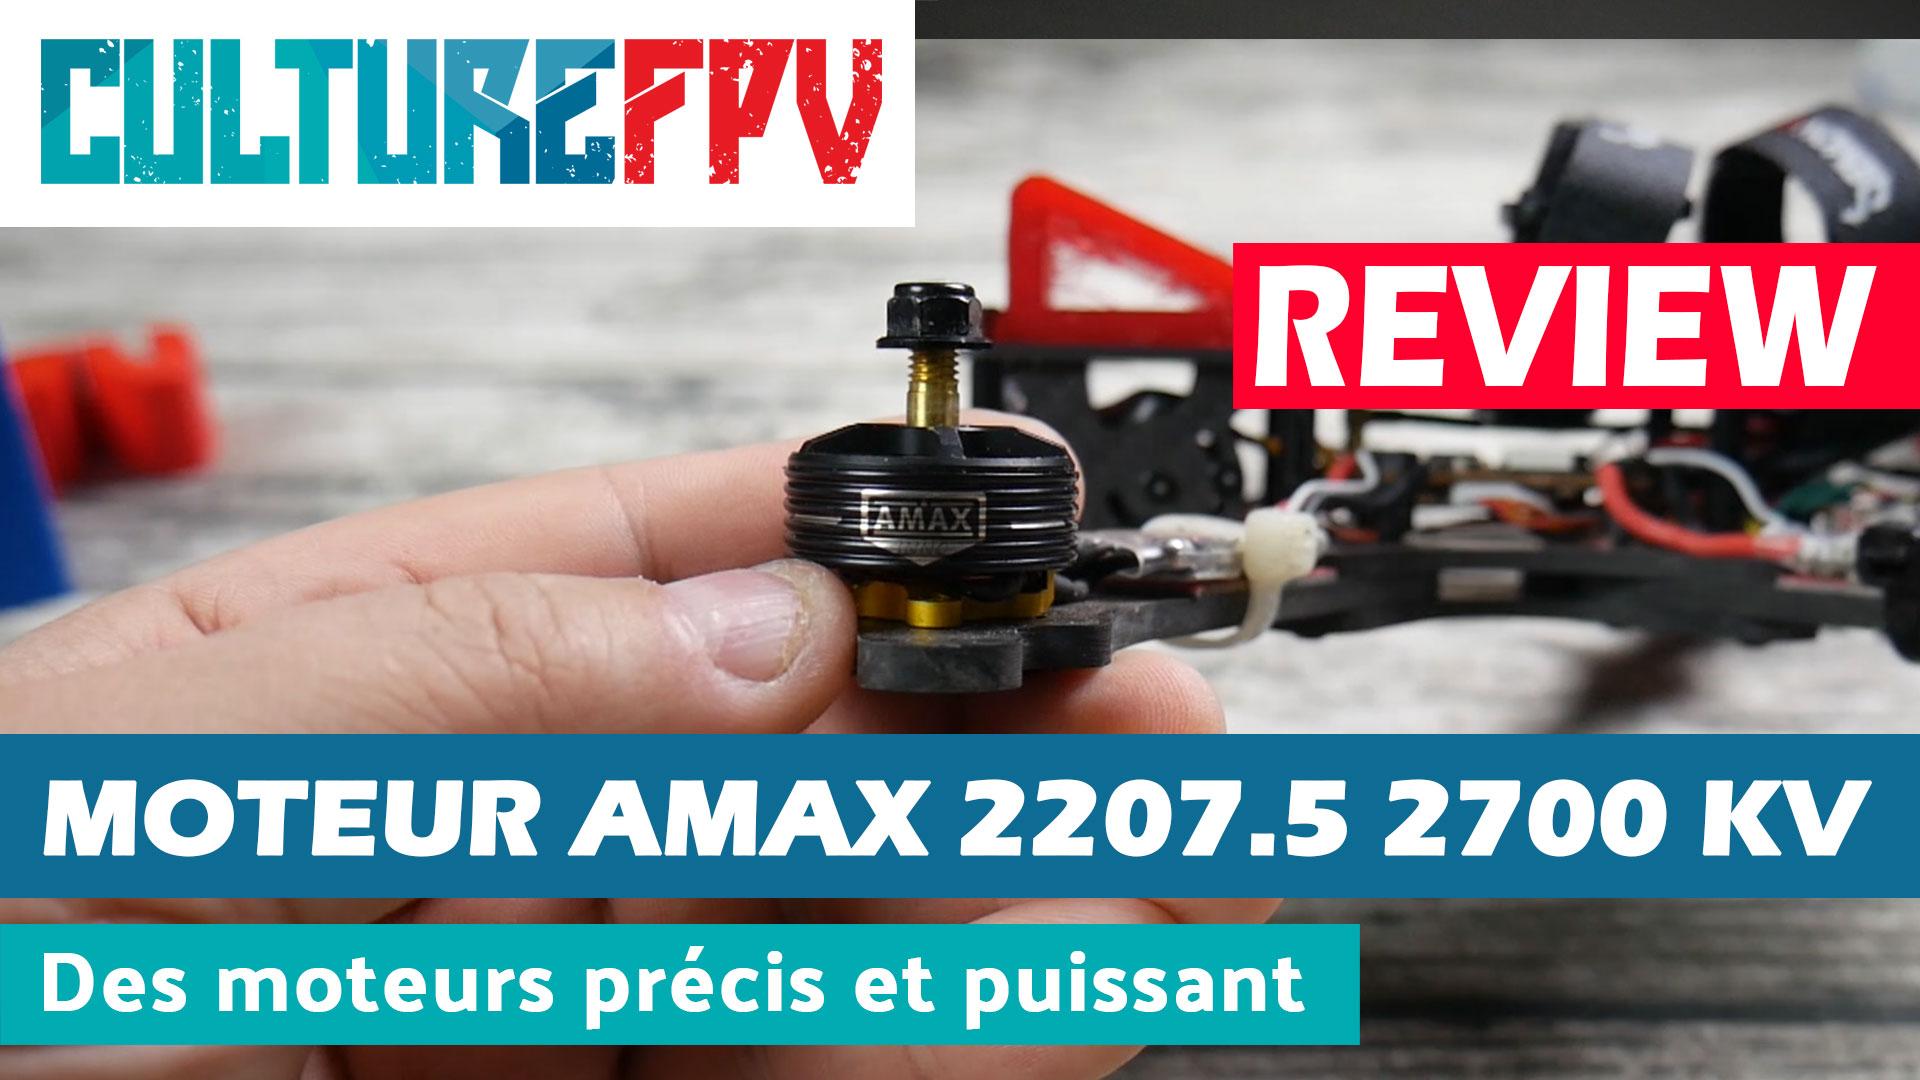 AMAX 2207.5 2700 KV